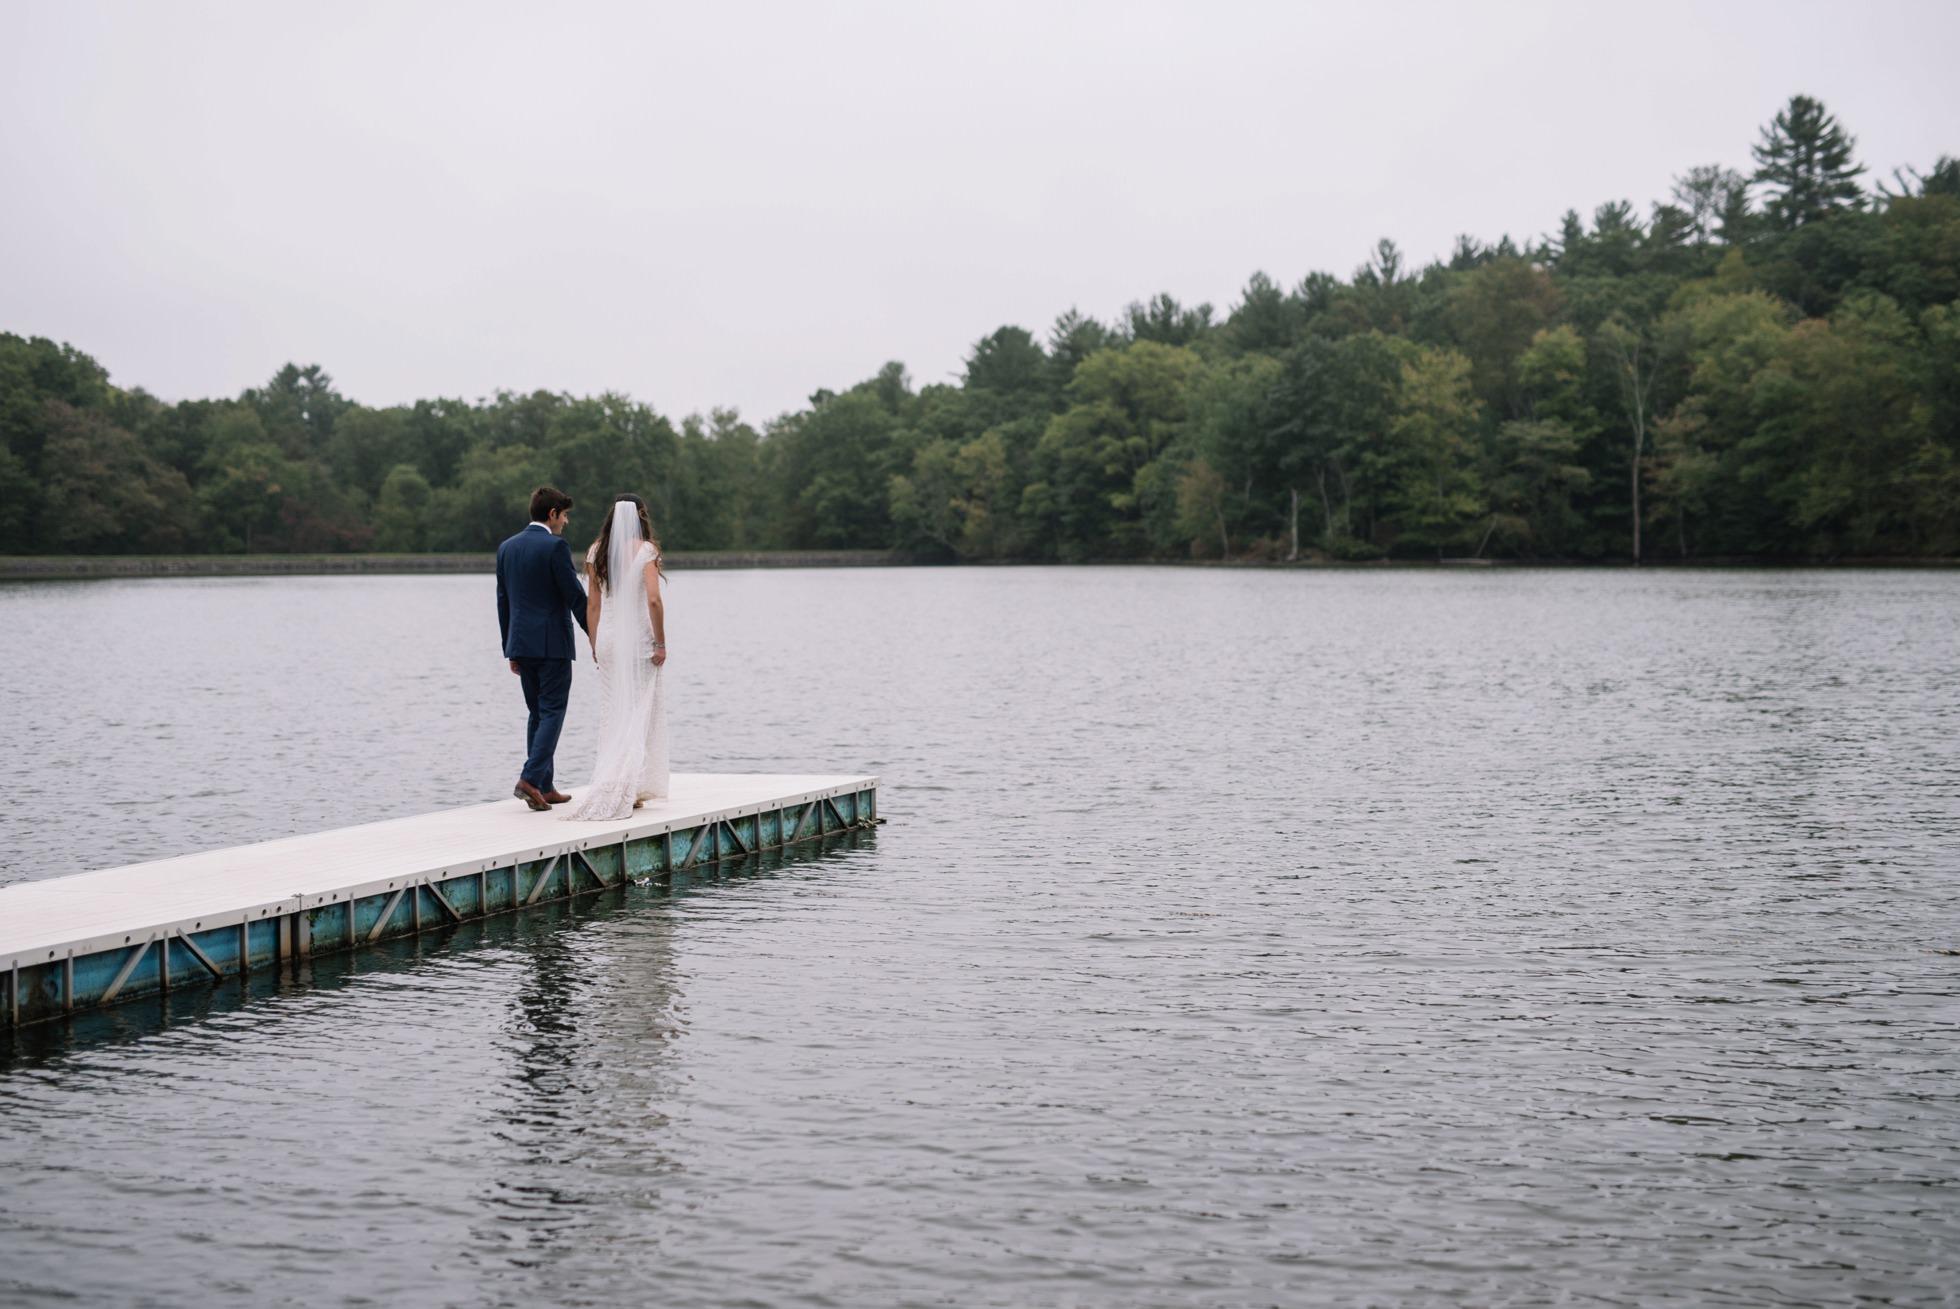 Best Unique PA NY NJ Wedding Venues - Pocono Springs Scout Camp Lakeside